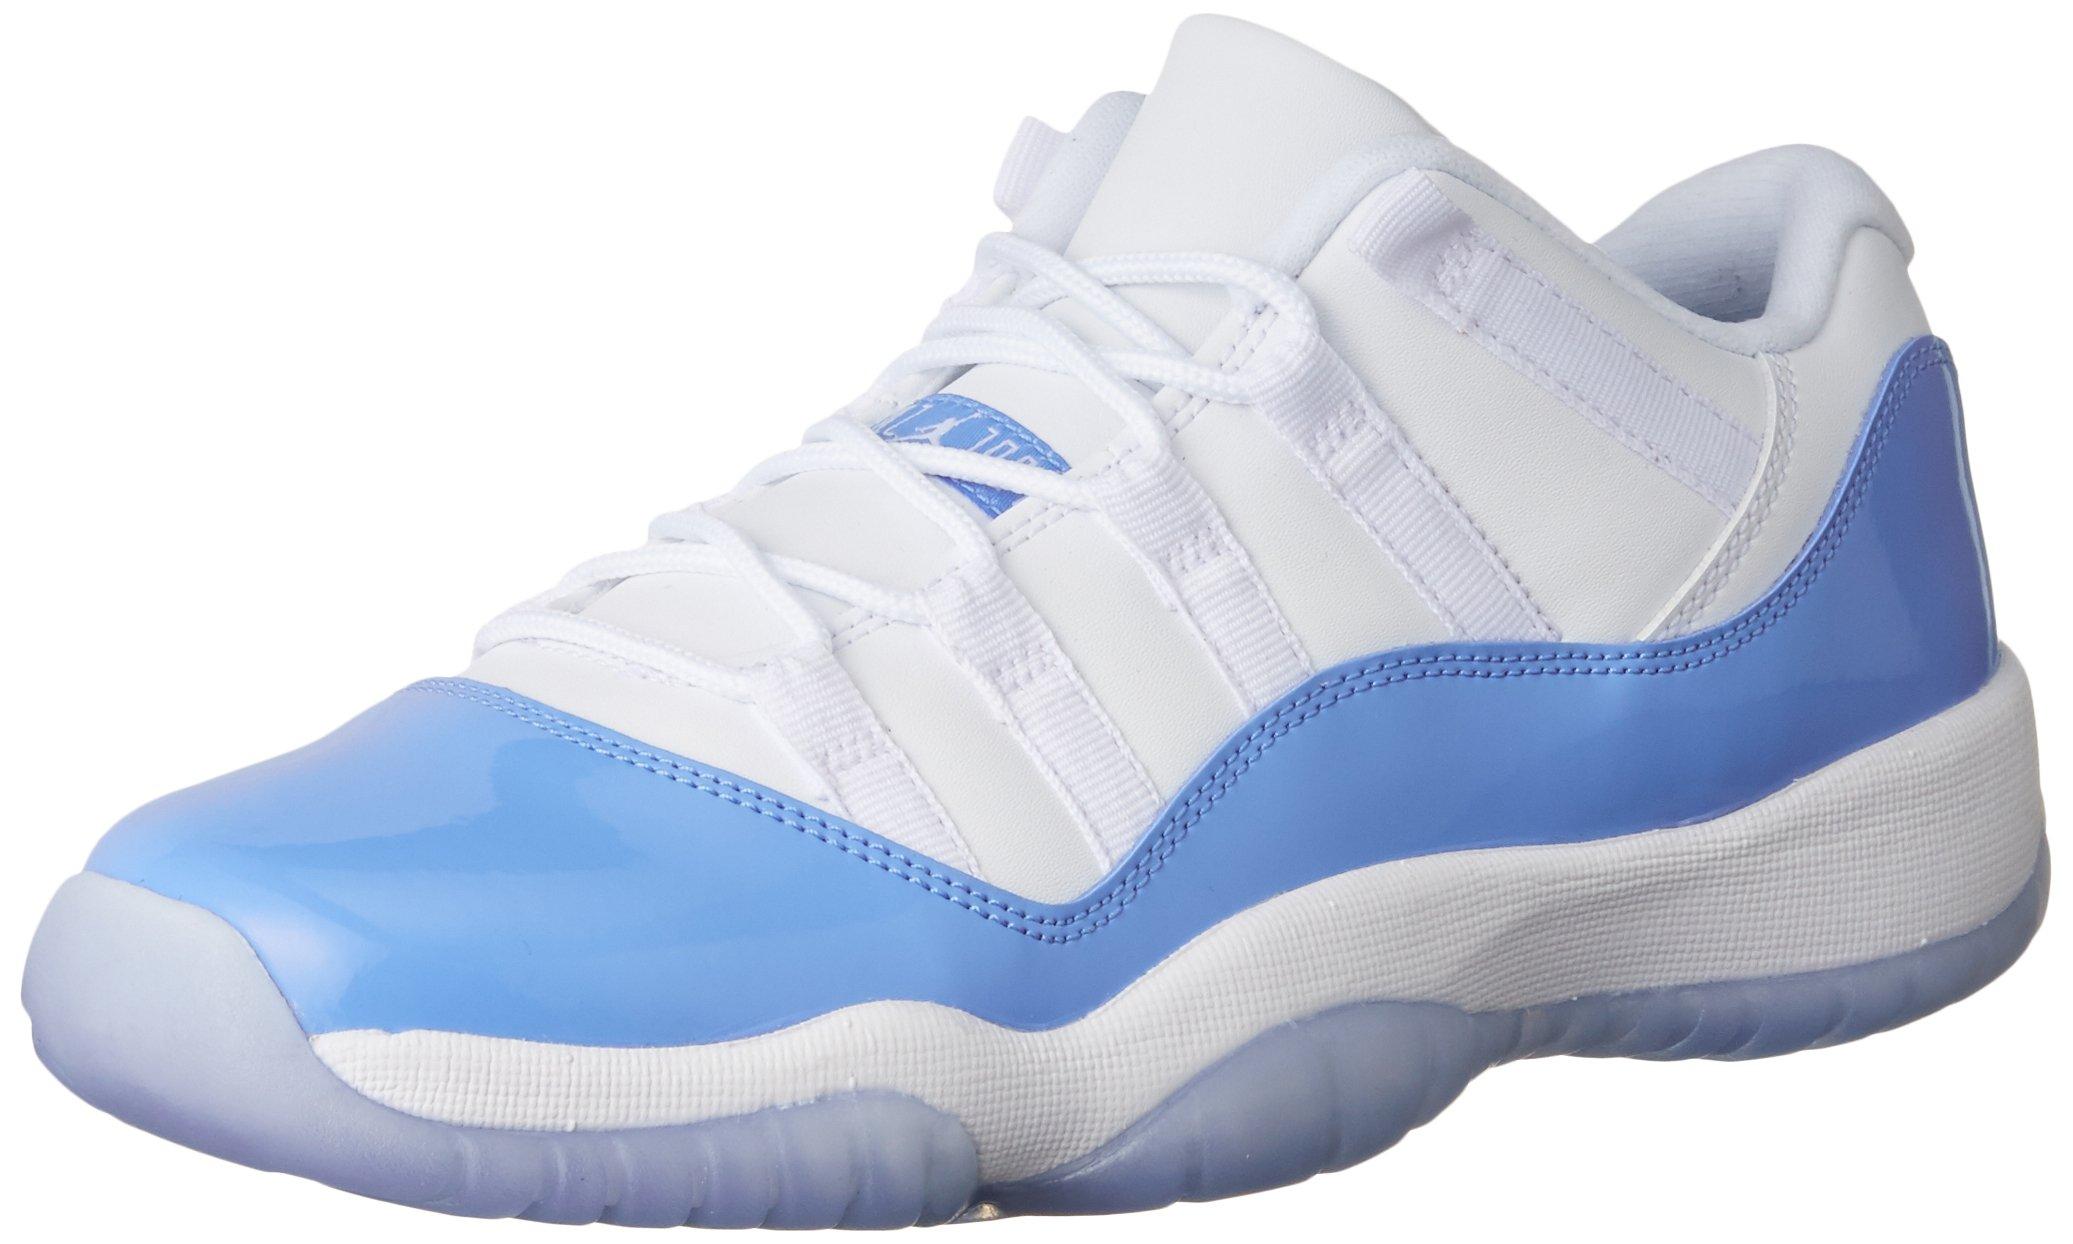 Jordan Nike Kids 11 Retro Low Bg White/University Blue Basketball Shoe 6 Kids US